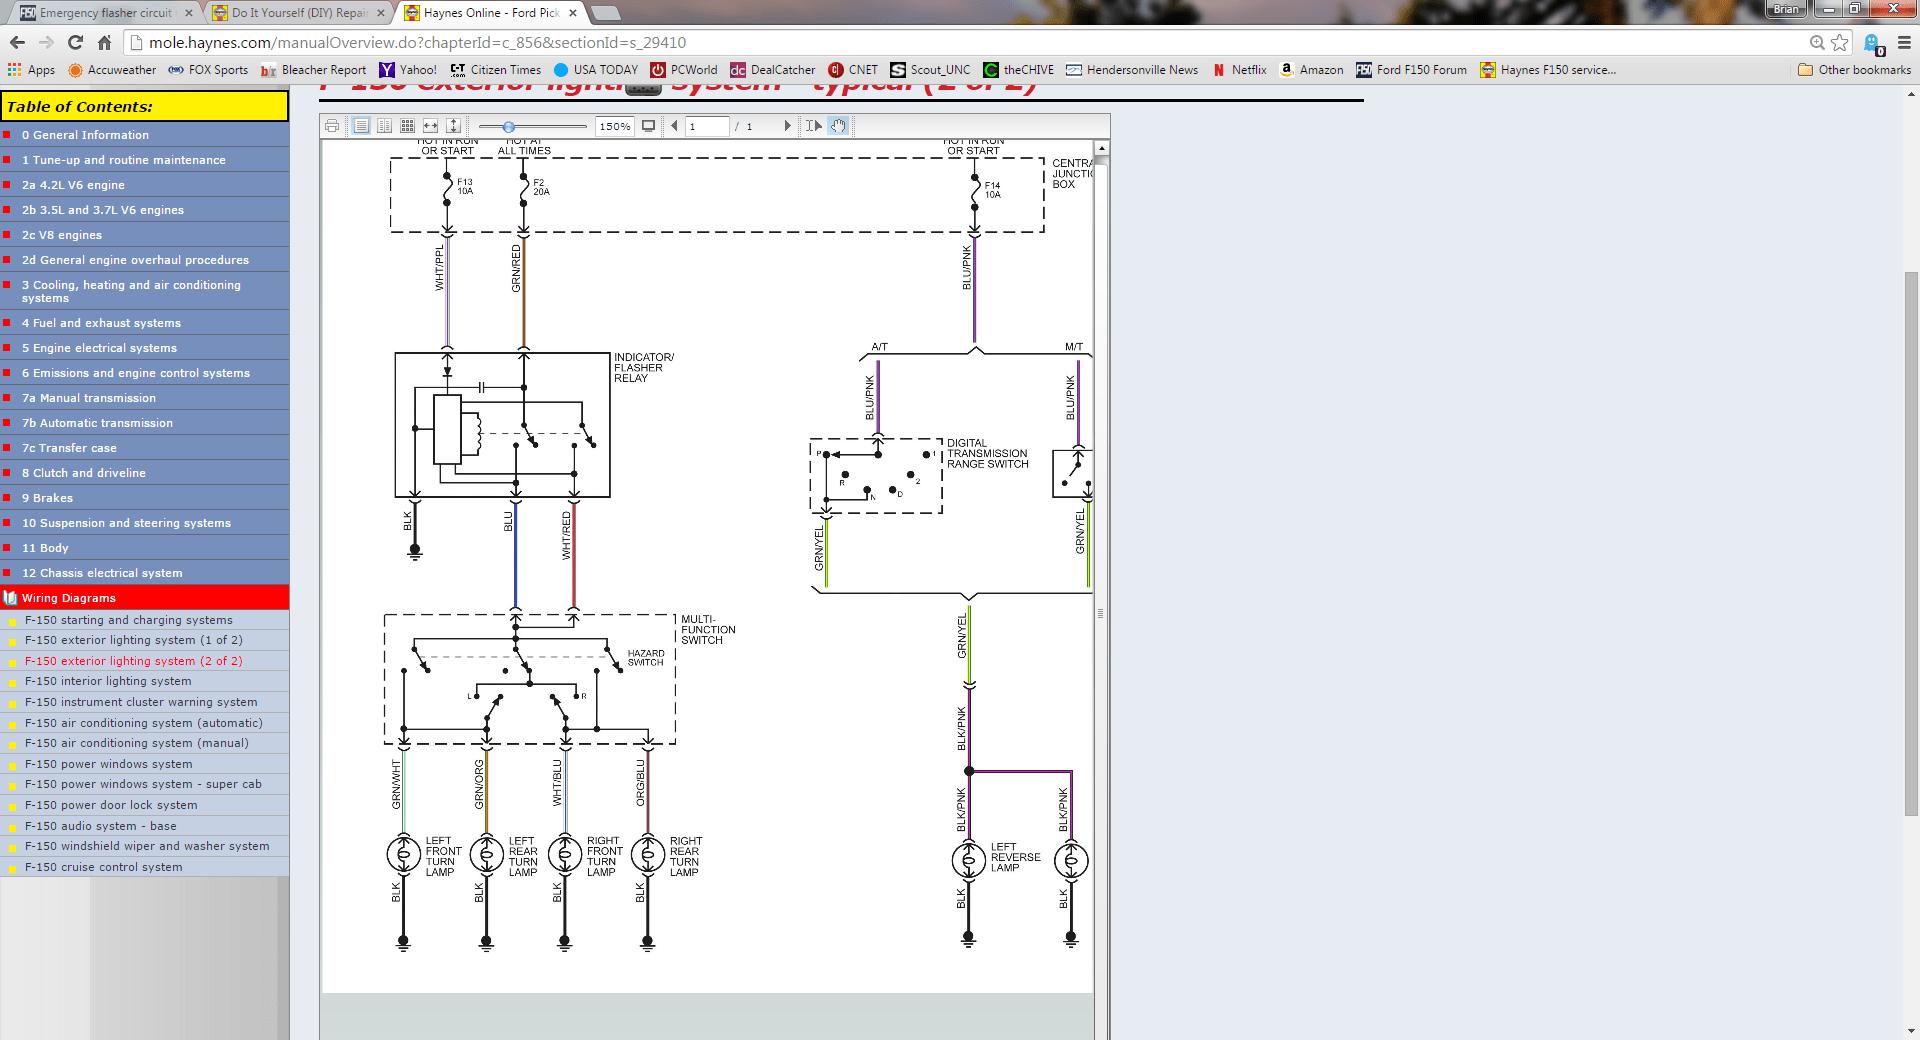 whelen light bar wiring diagram turbo timer strobe club car